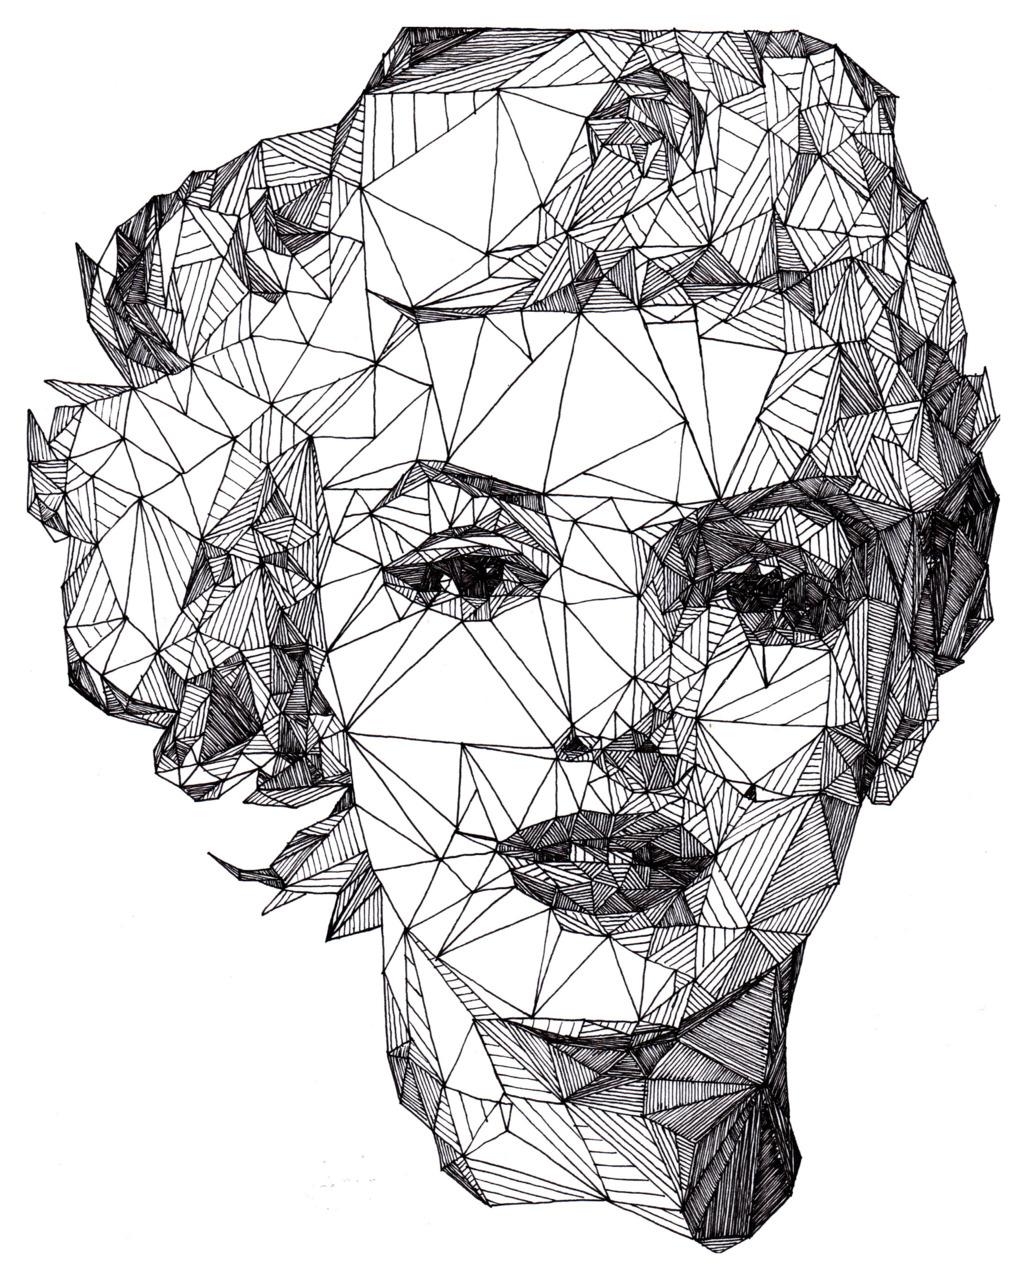 1027x1280 Marilyn Monroe Black And White Drawing Marilyn Monroe